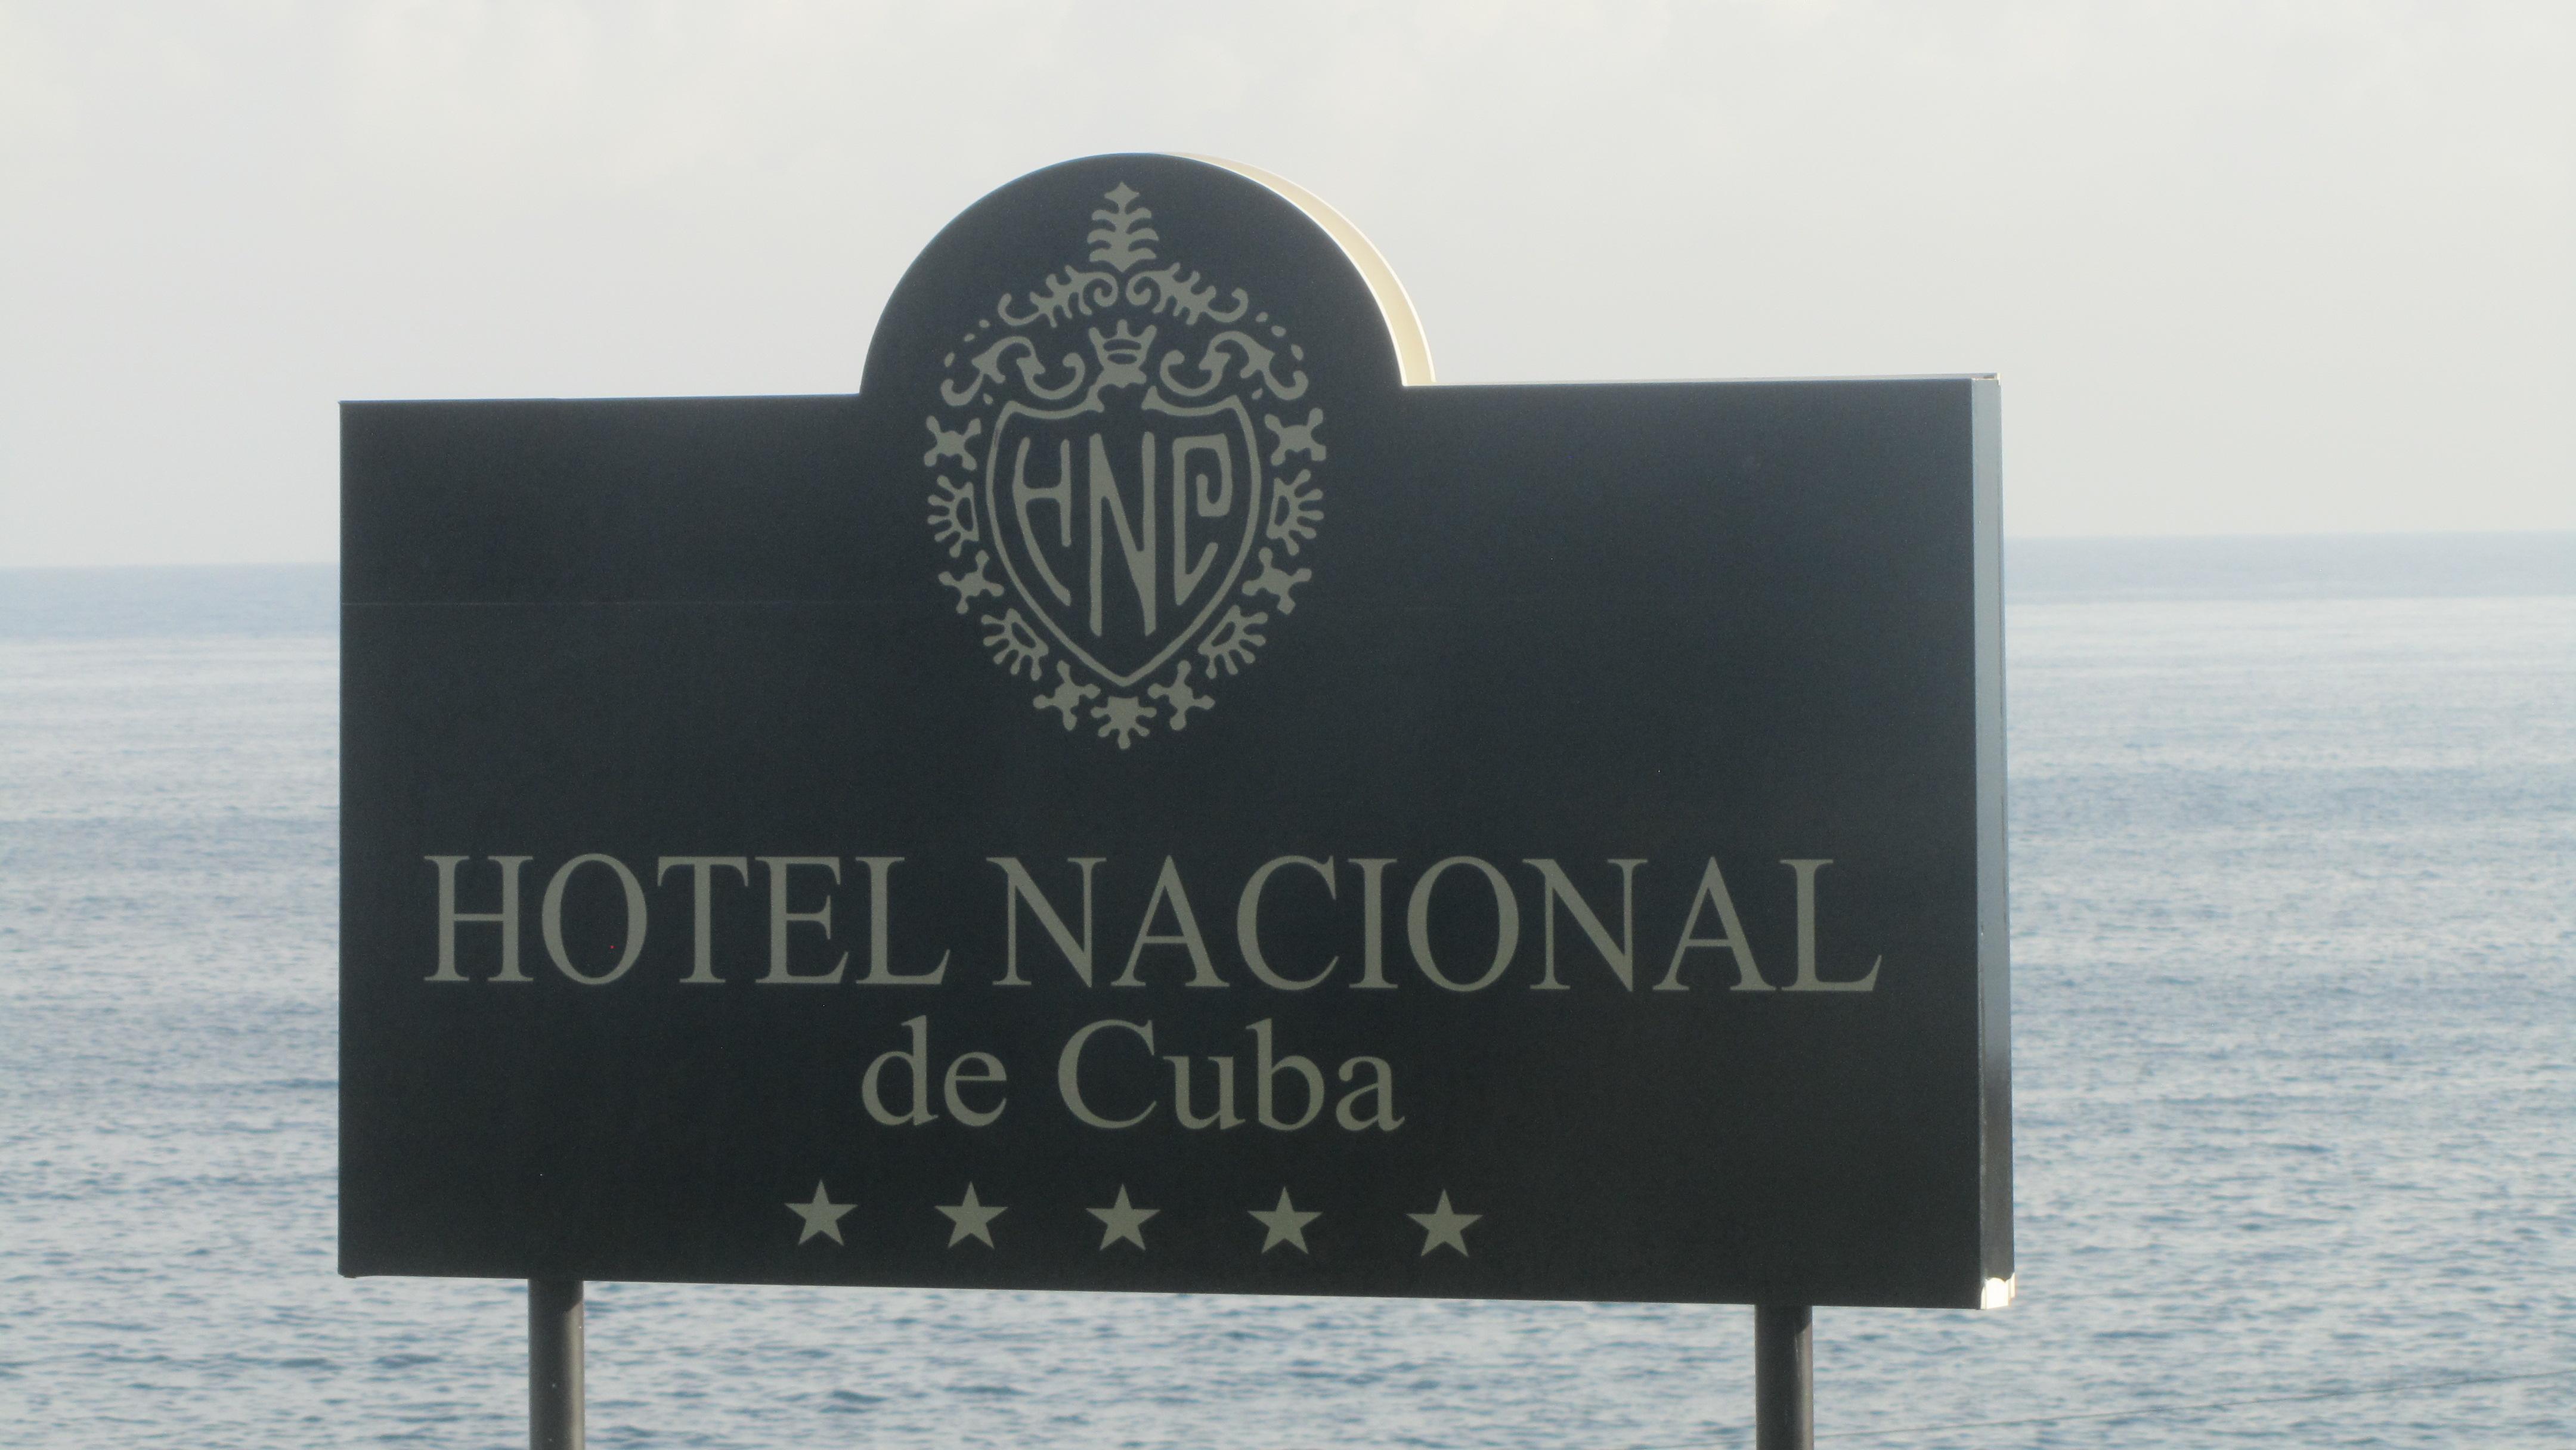 Nacional: Hotel Nacional De Cuba Havana Cuba